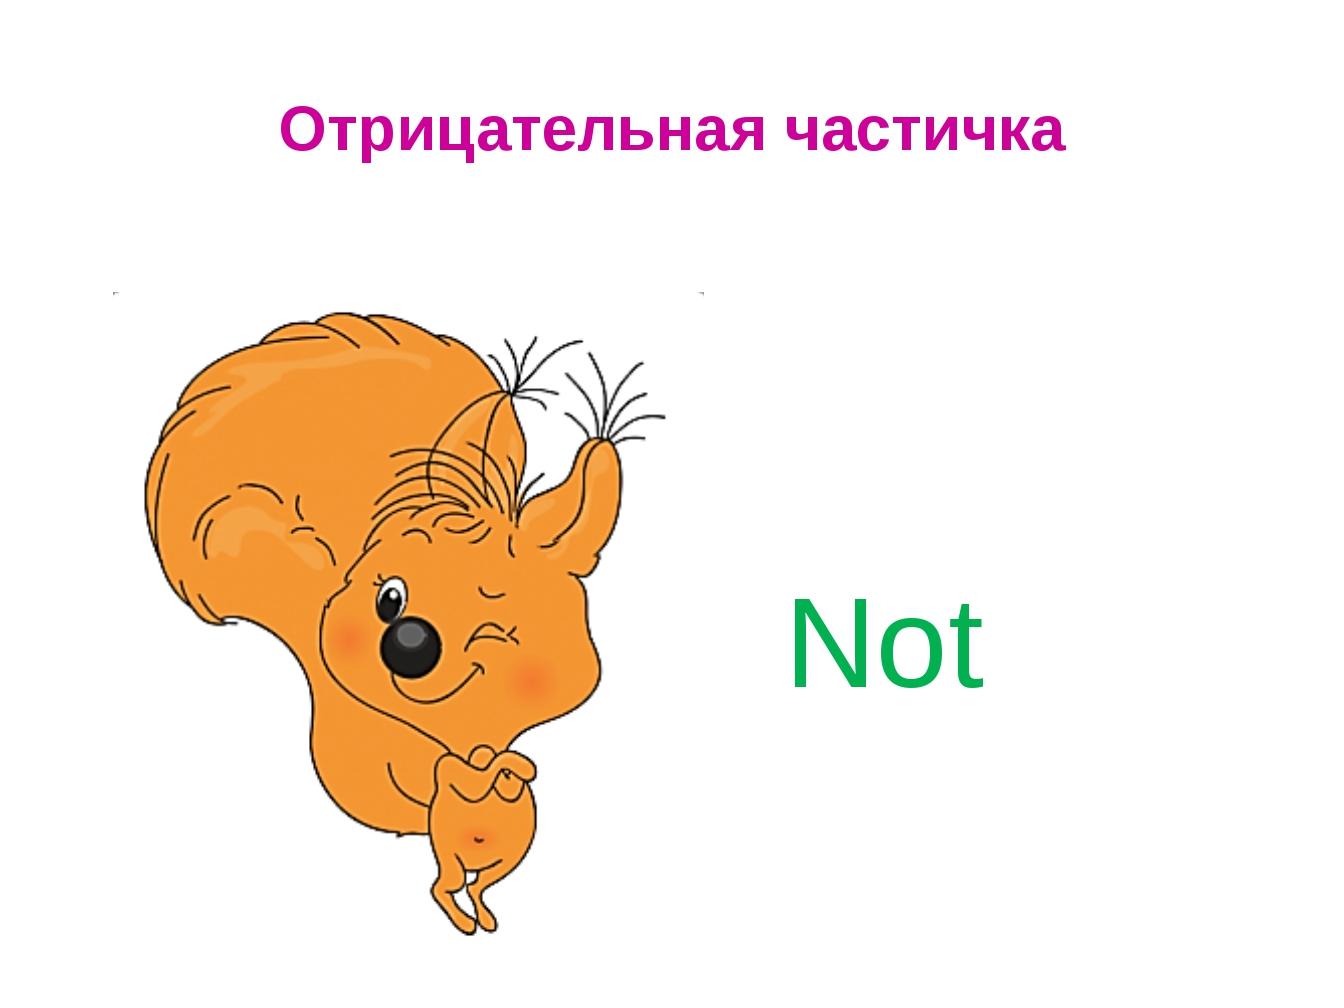 Отрицательная частичка Not